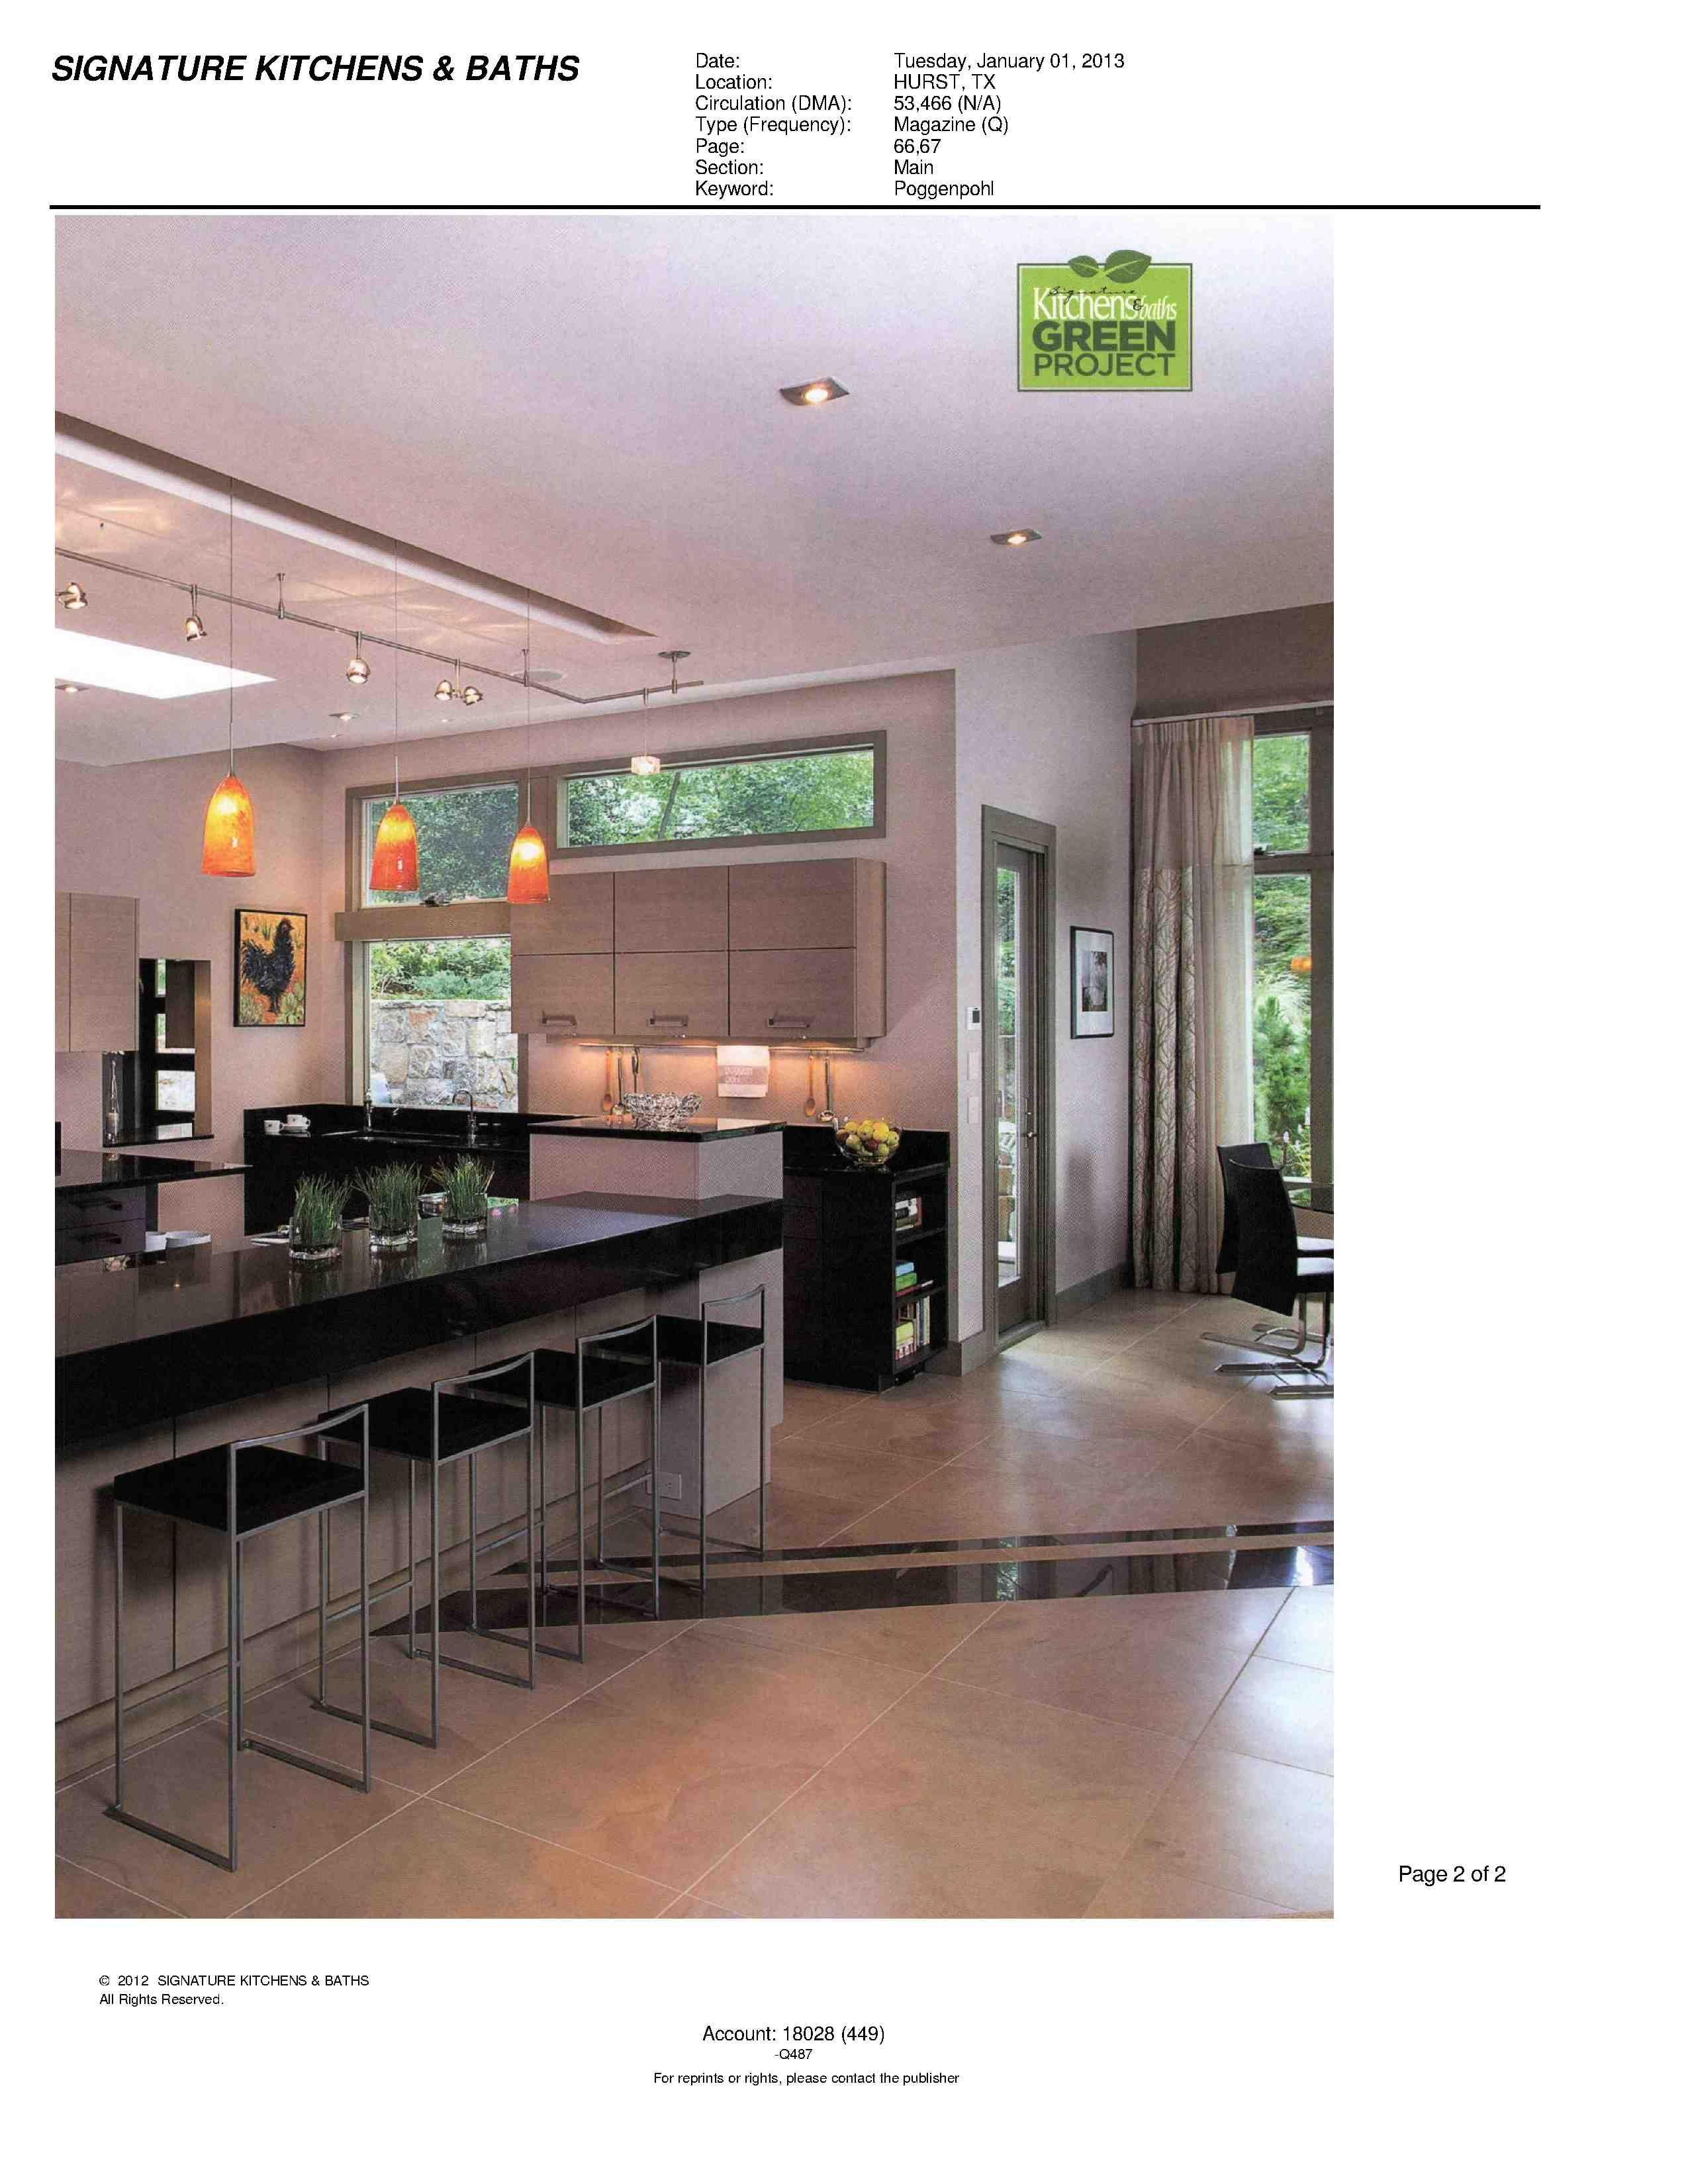 Signature Kitchens & Baths Poggenpohl Atlanta Project ...